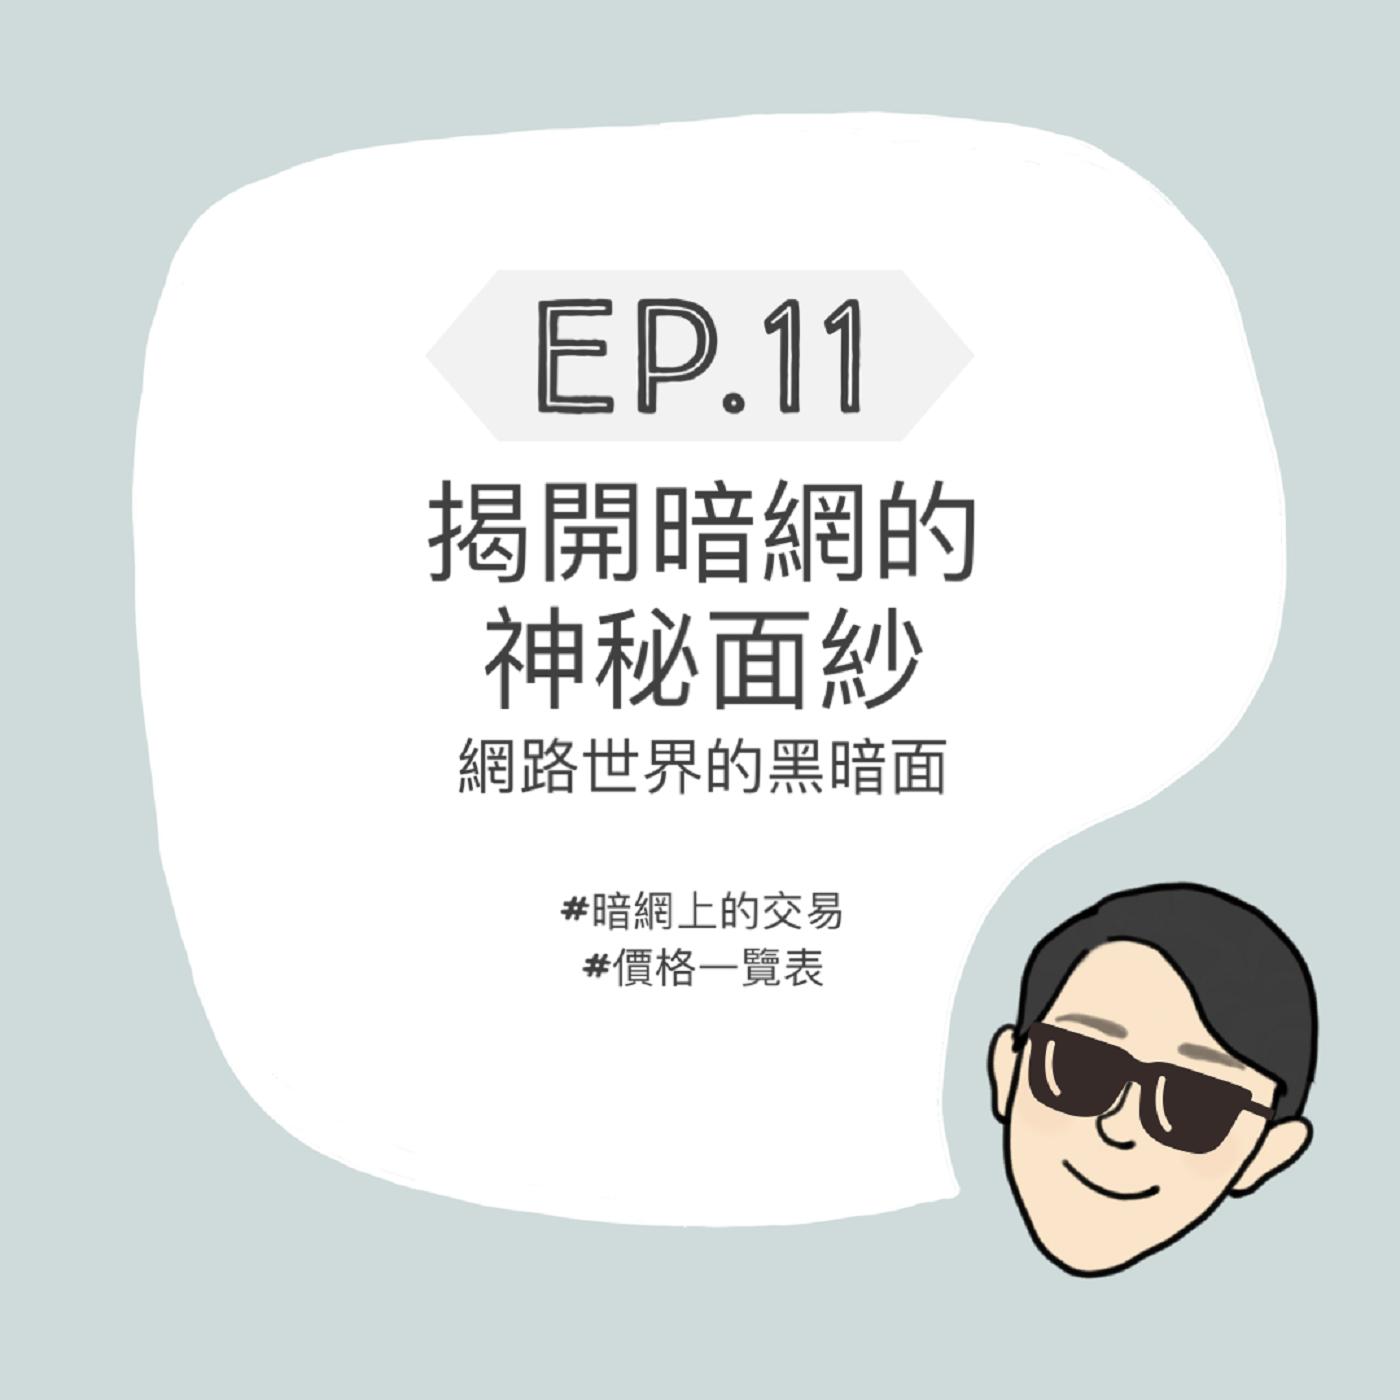 EP11 - 揭開暗網的神祕面紗